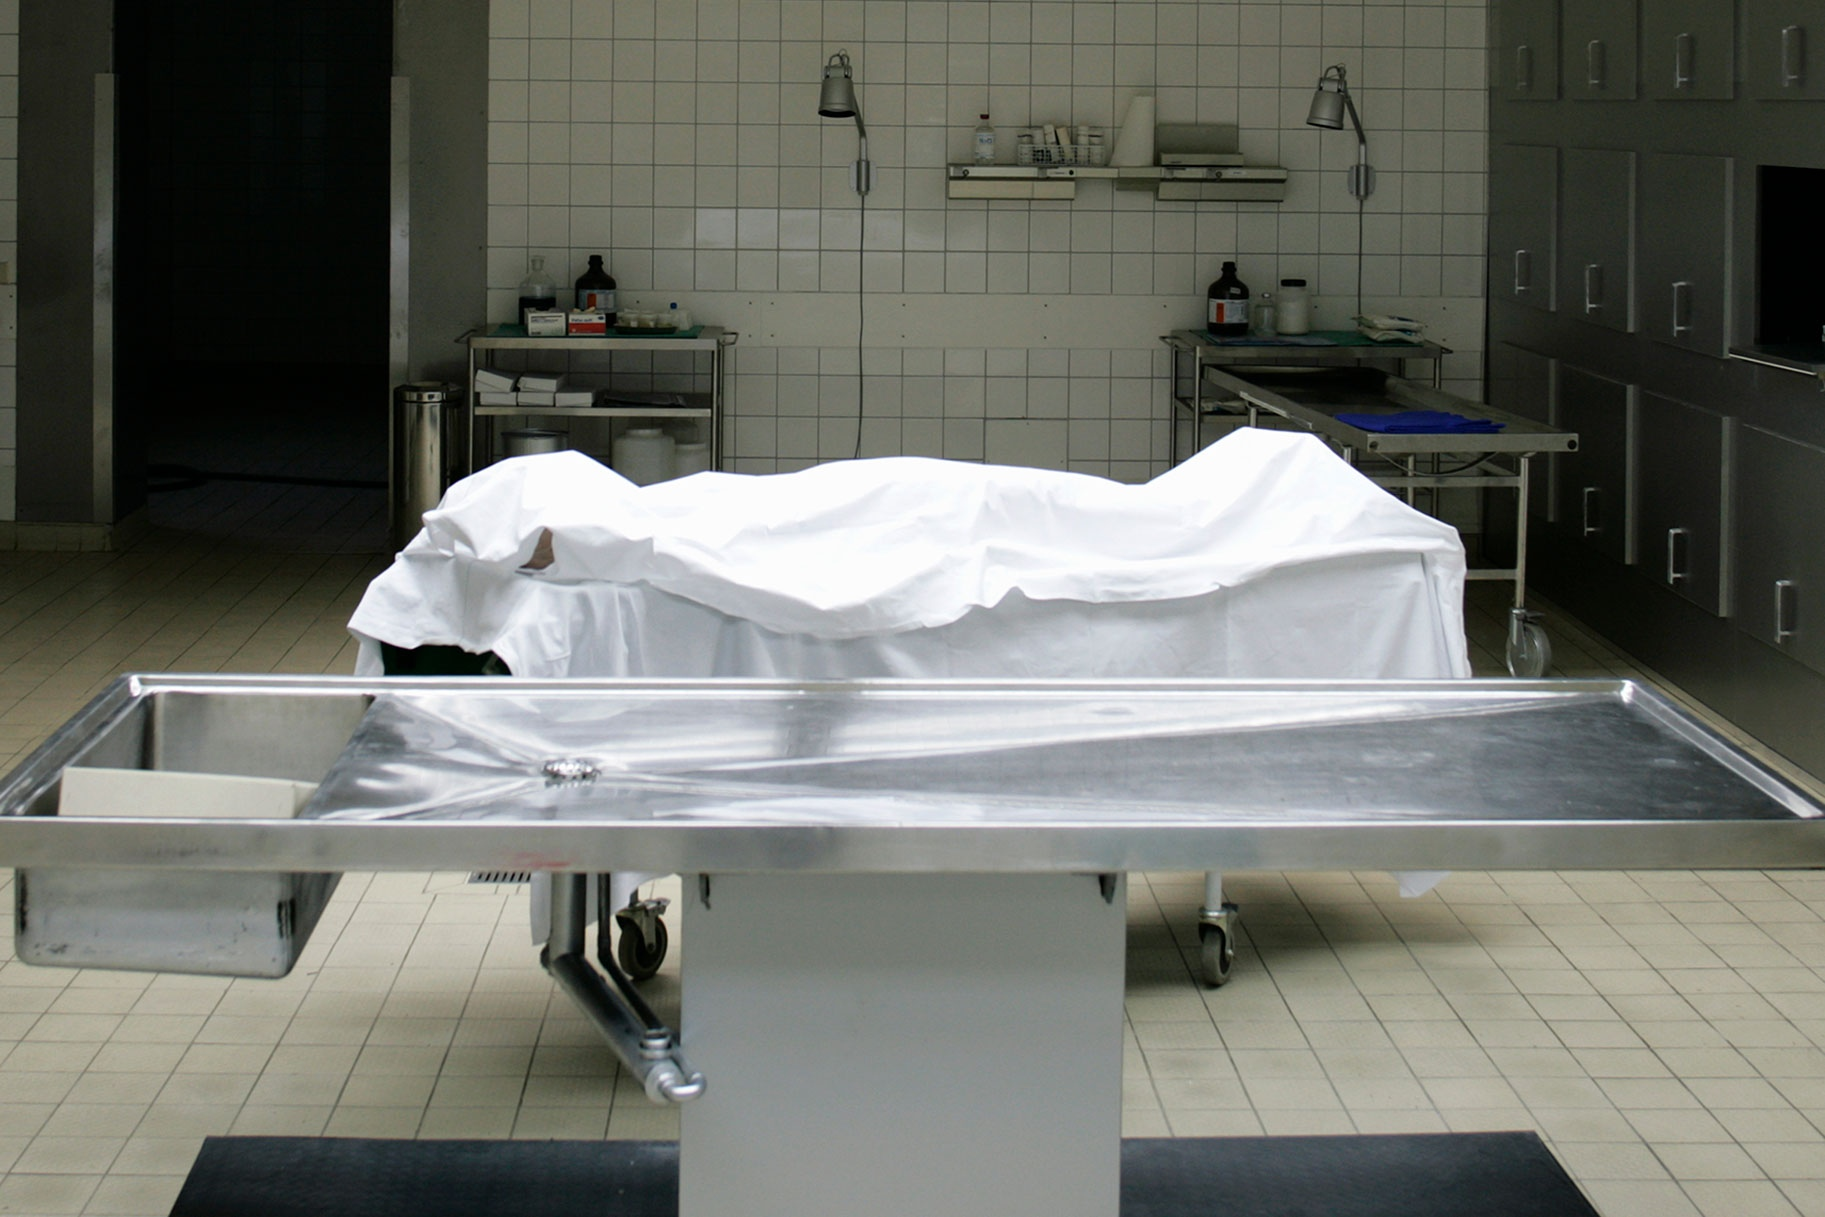 Мужчину застукали за лизанием женского тела в морге